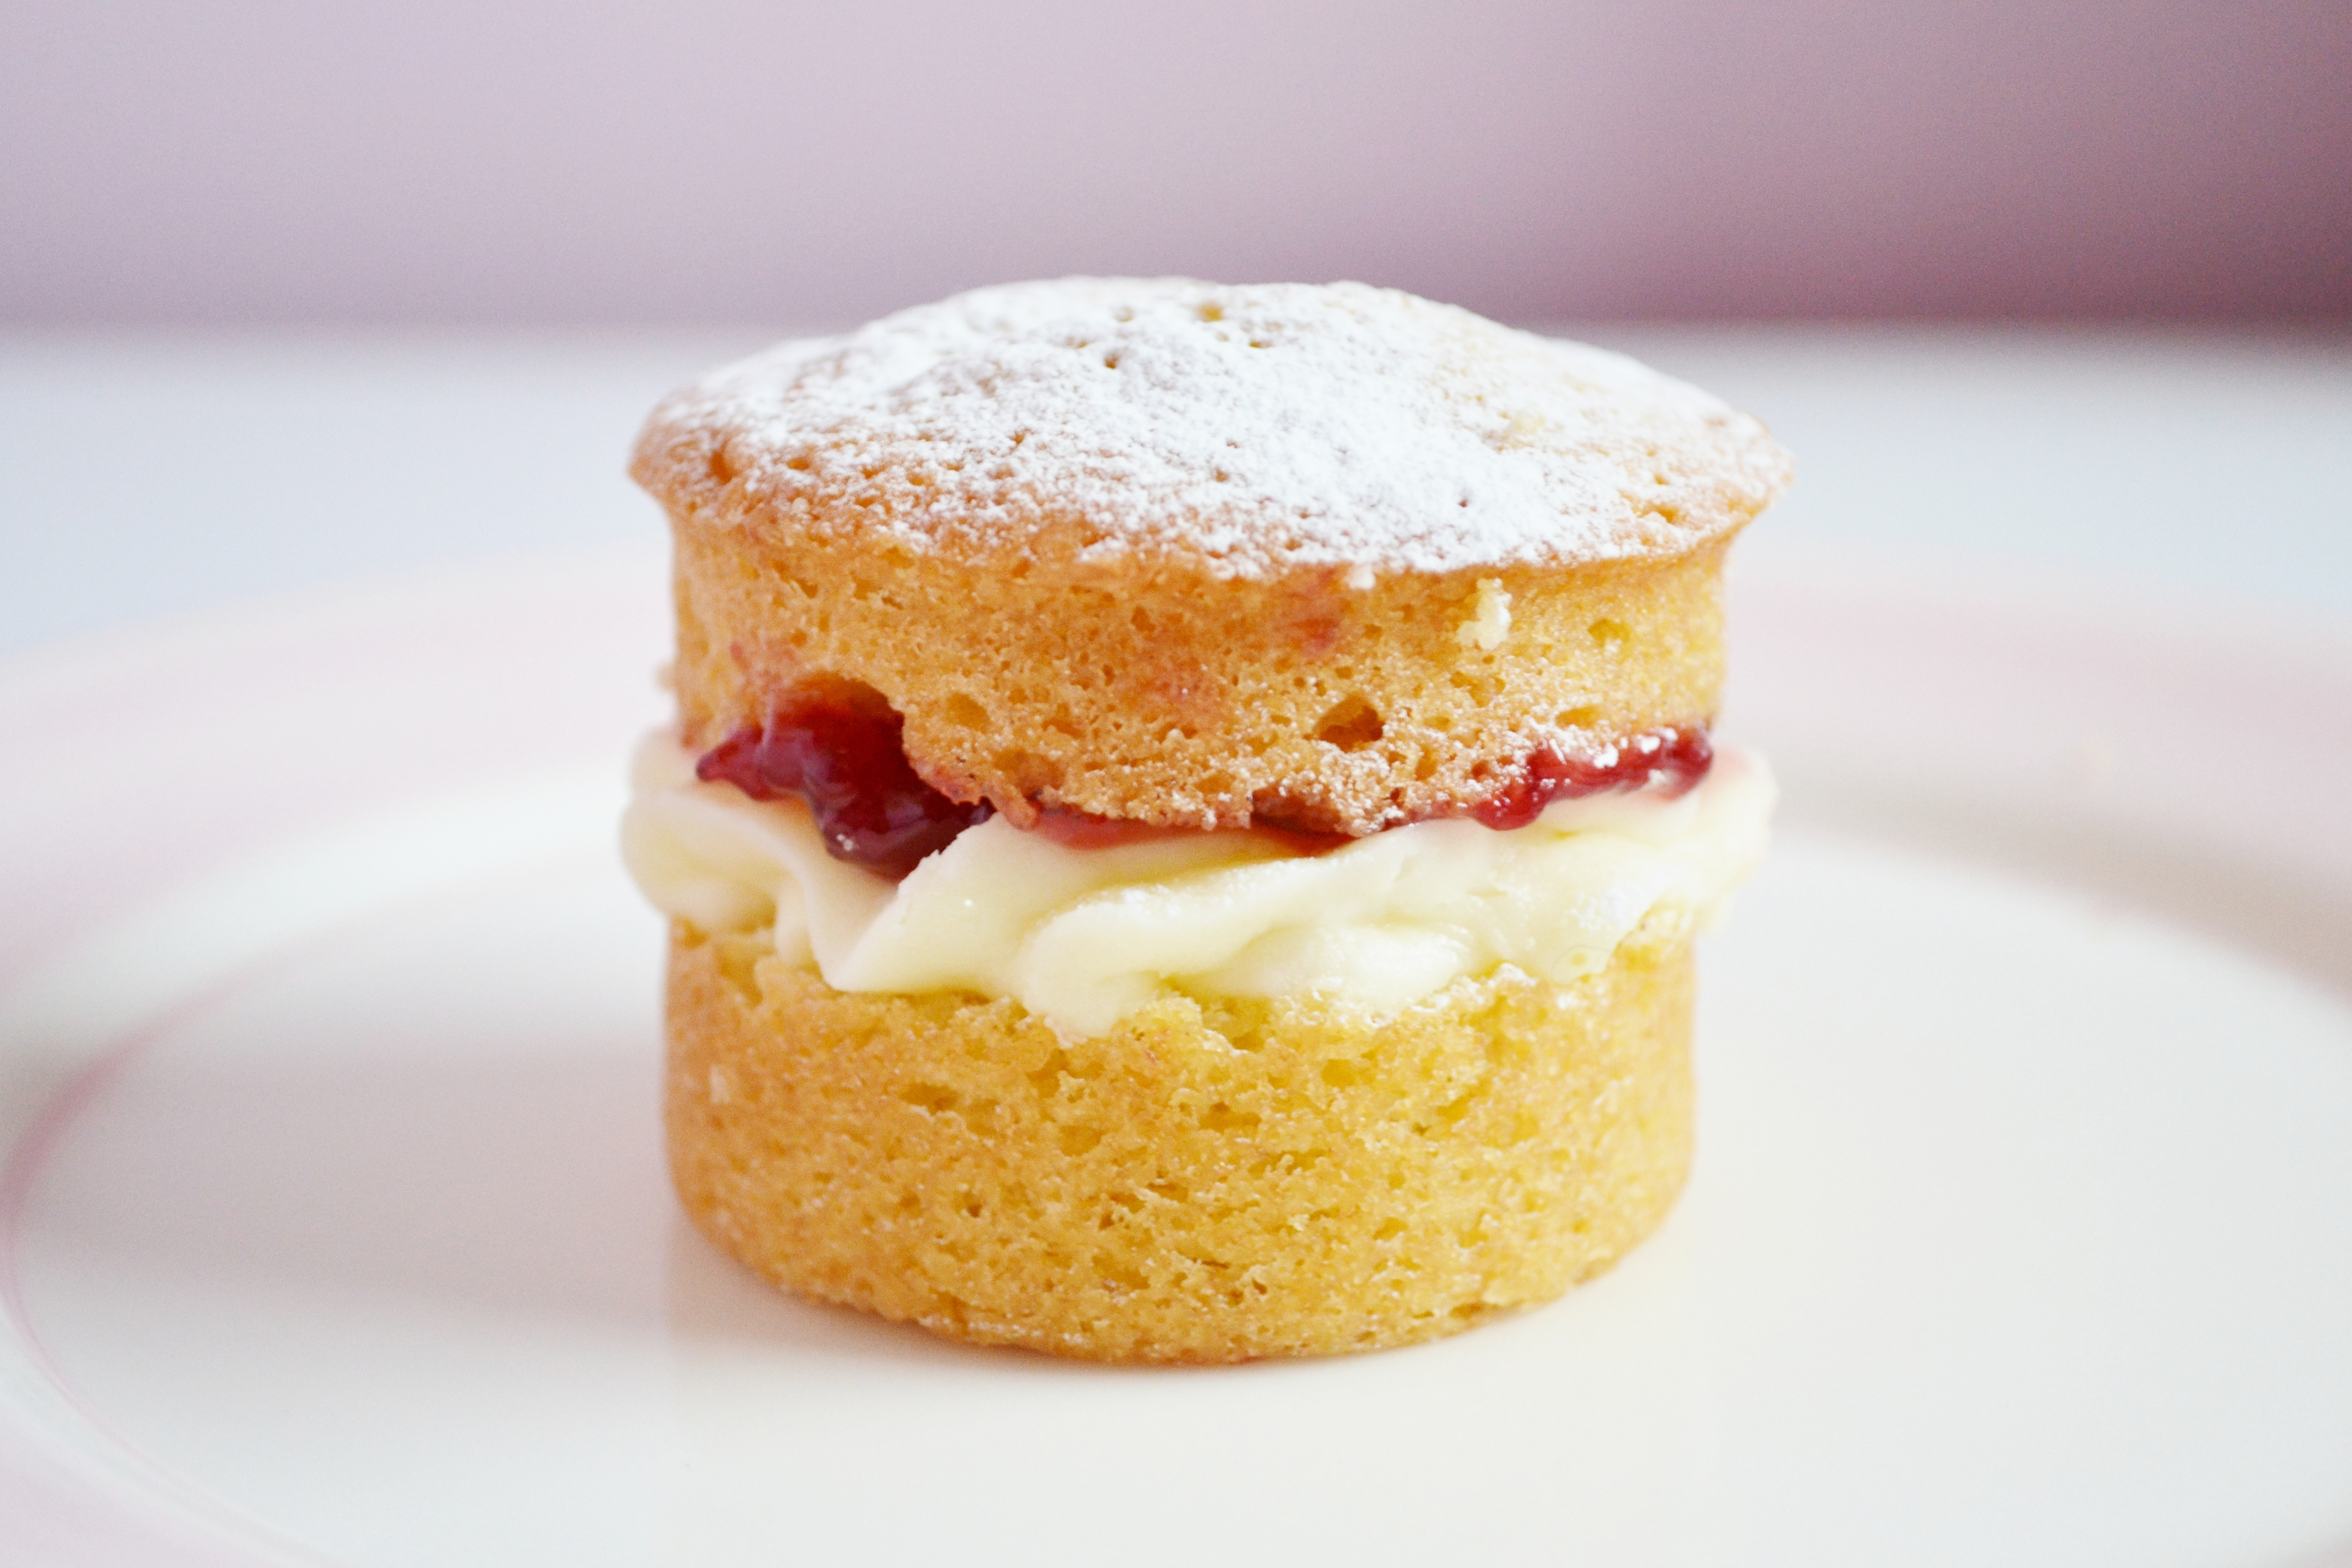 Sponge Cake Recipe Lemon Curd: What Saysie Makes